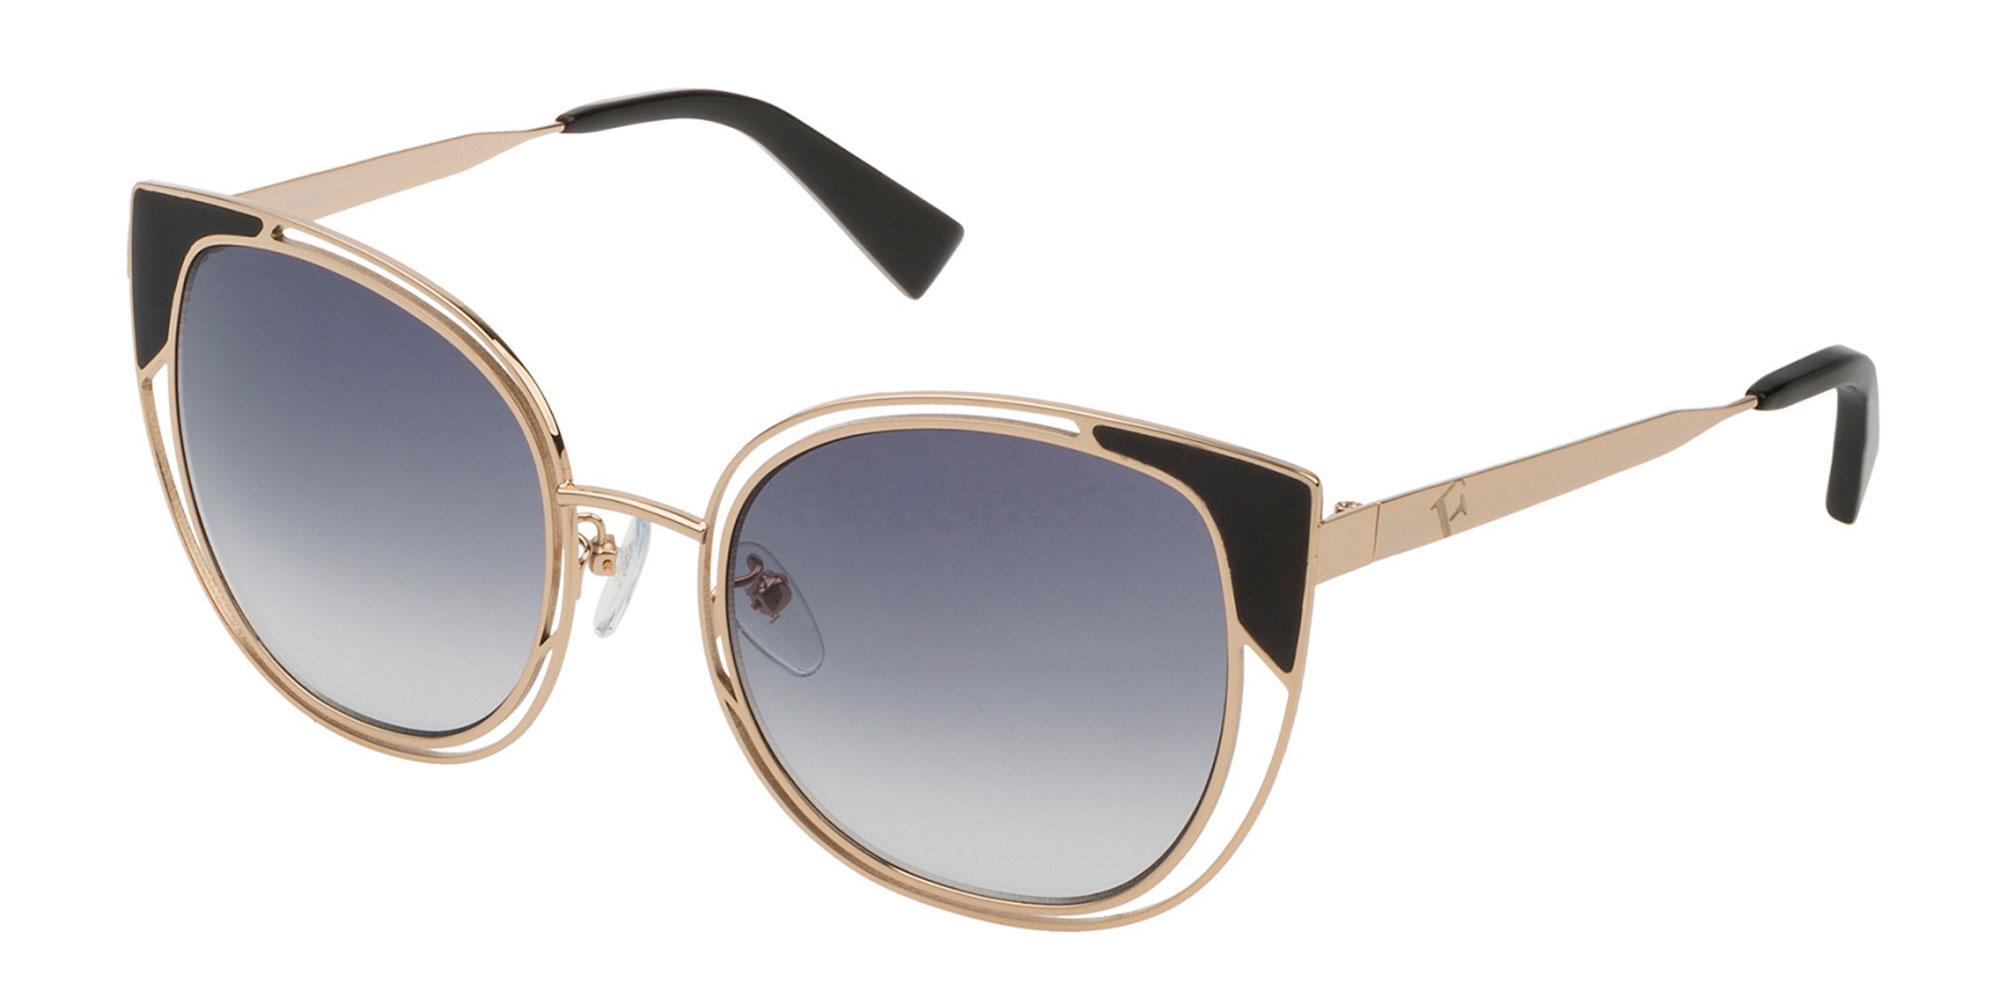 0300 SFU246 Sunglasses, Furla